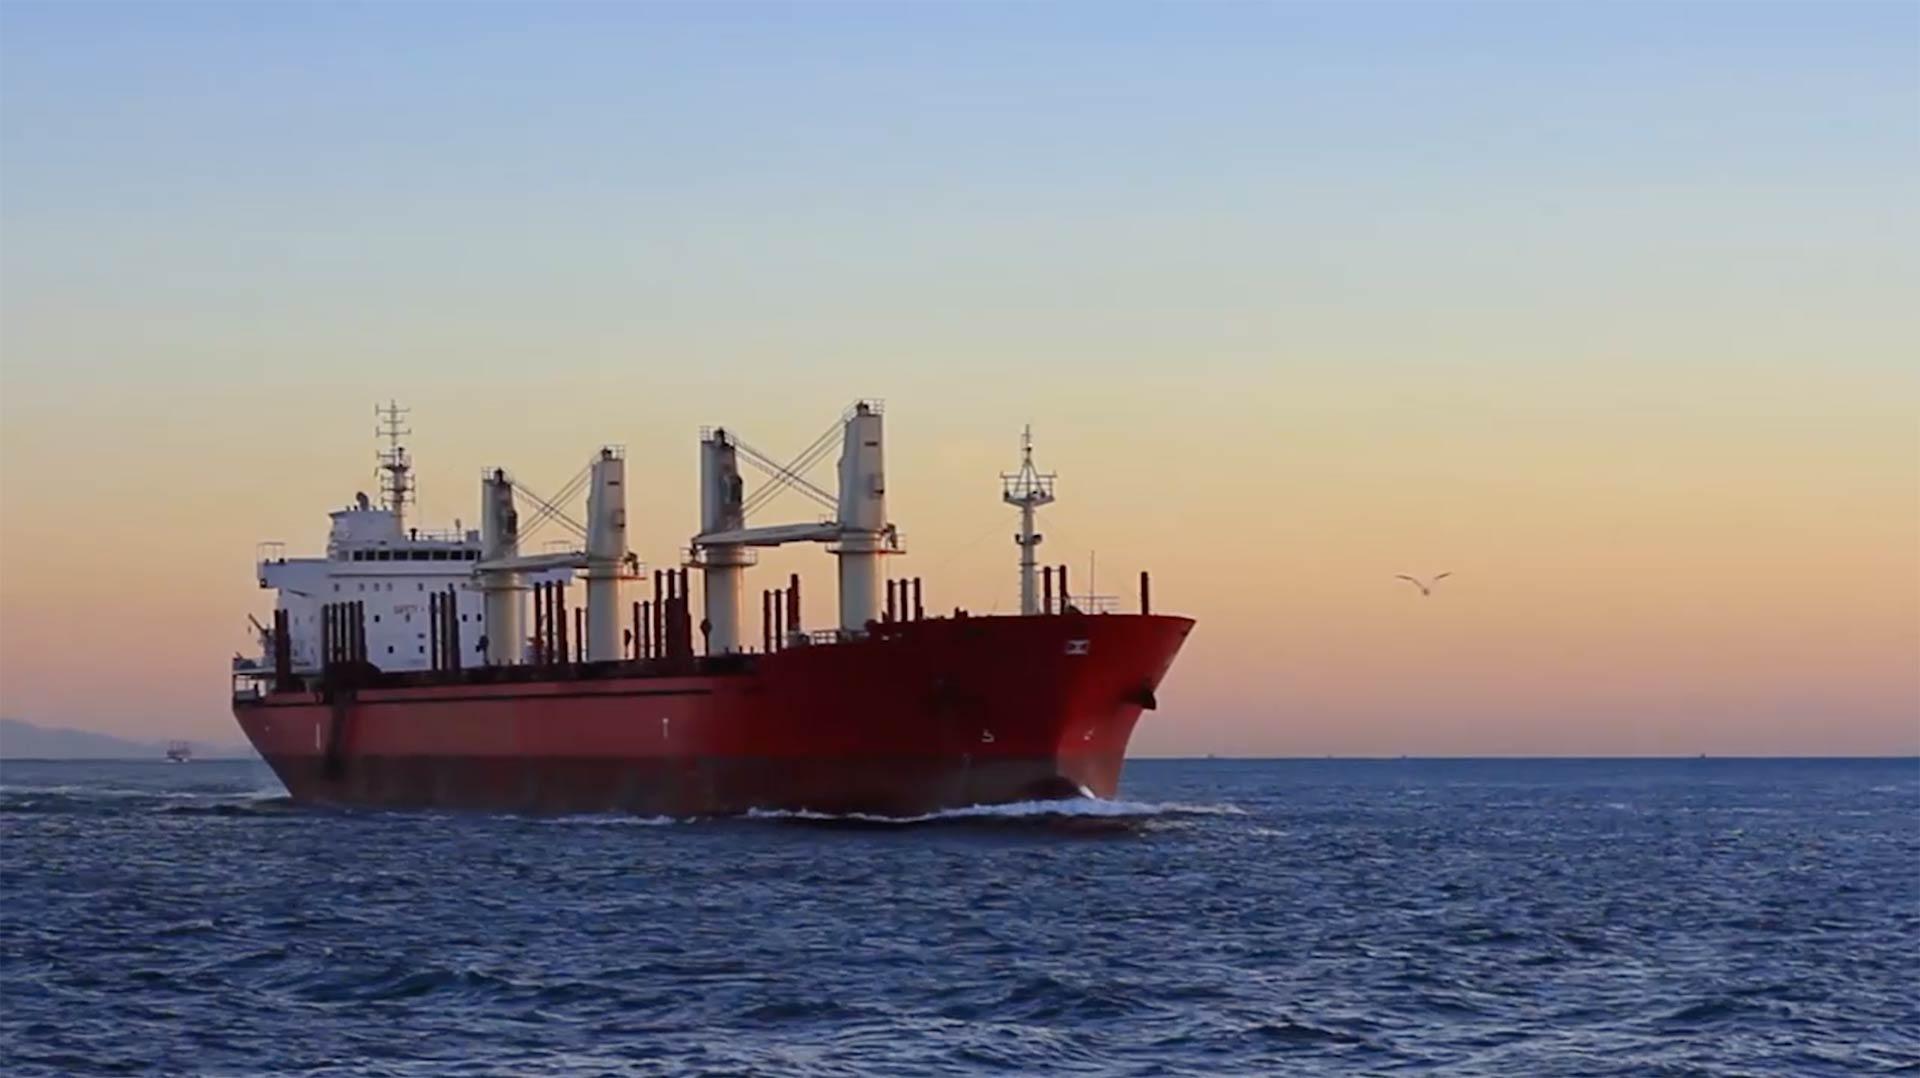 ship navigating on open sea